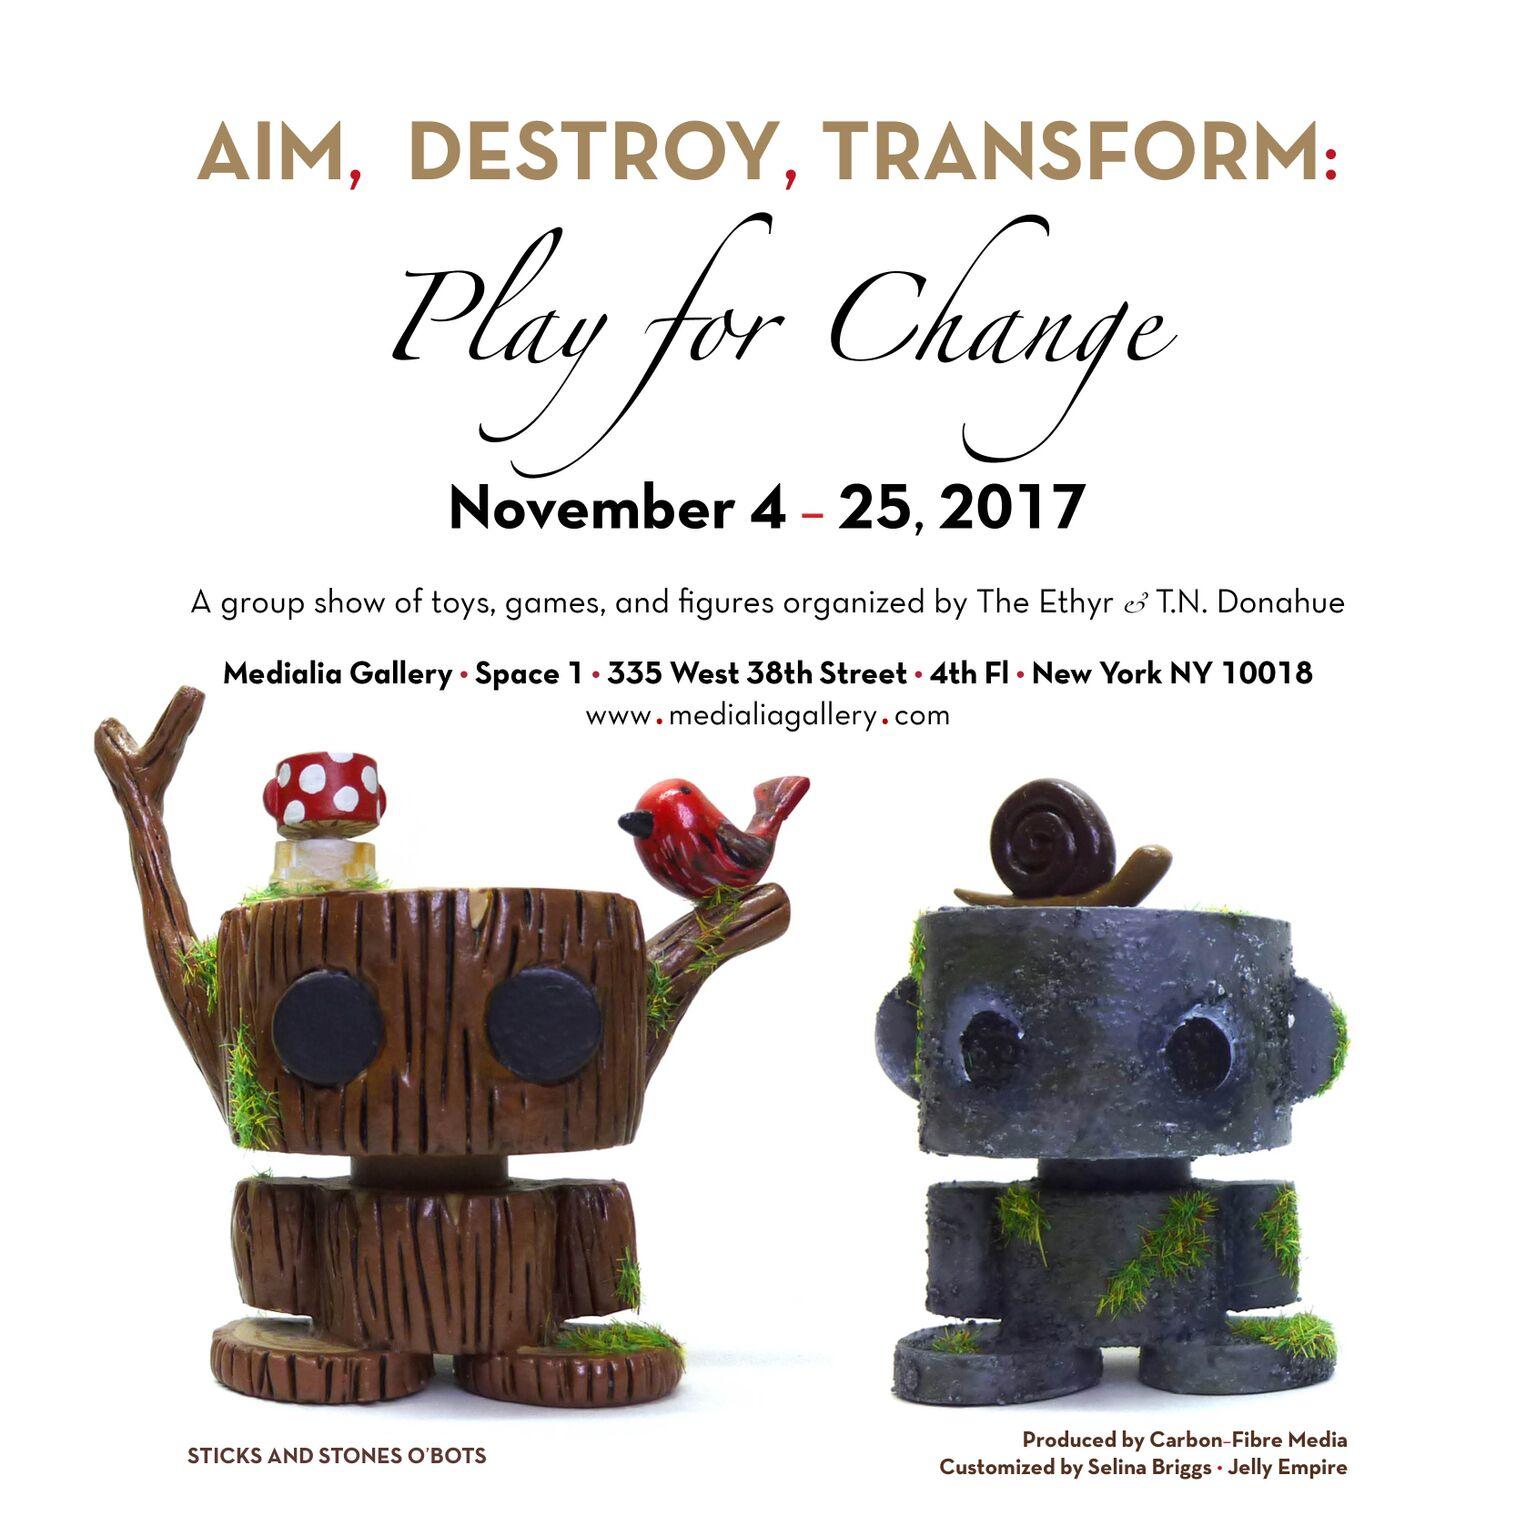 MedialiaGallery_The_Ethyr_AimDestroyTransform_Toy_Show_announcement_OBots_Sticks and Stones_November_2.jpg